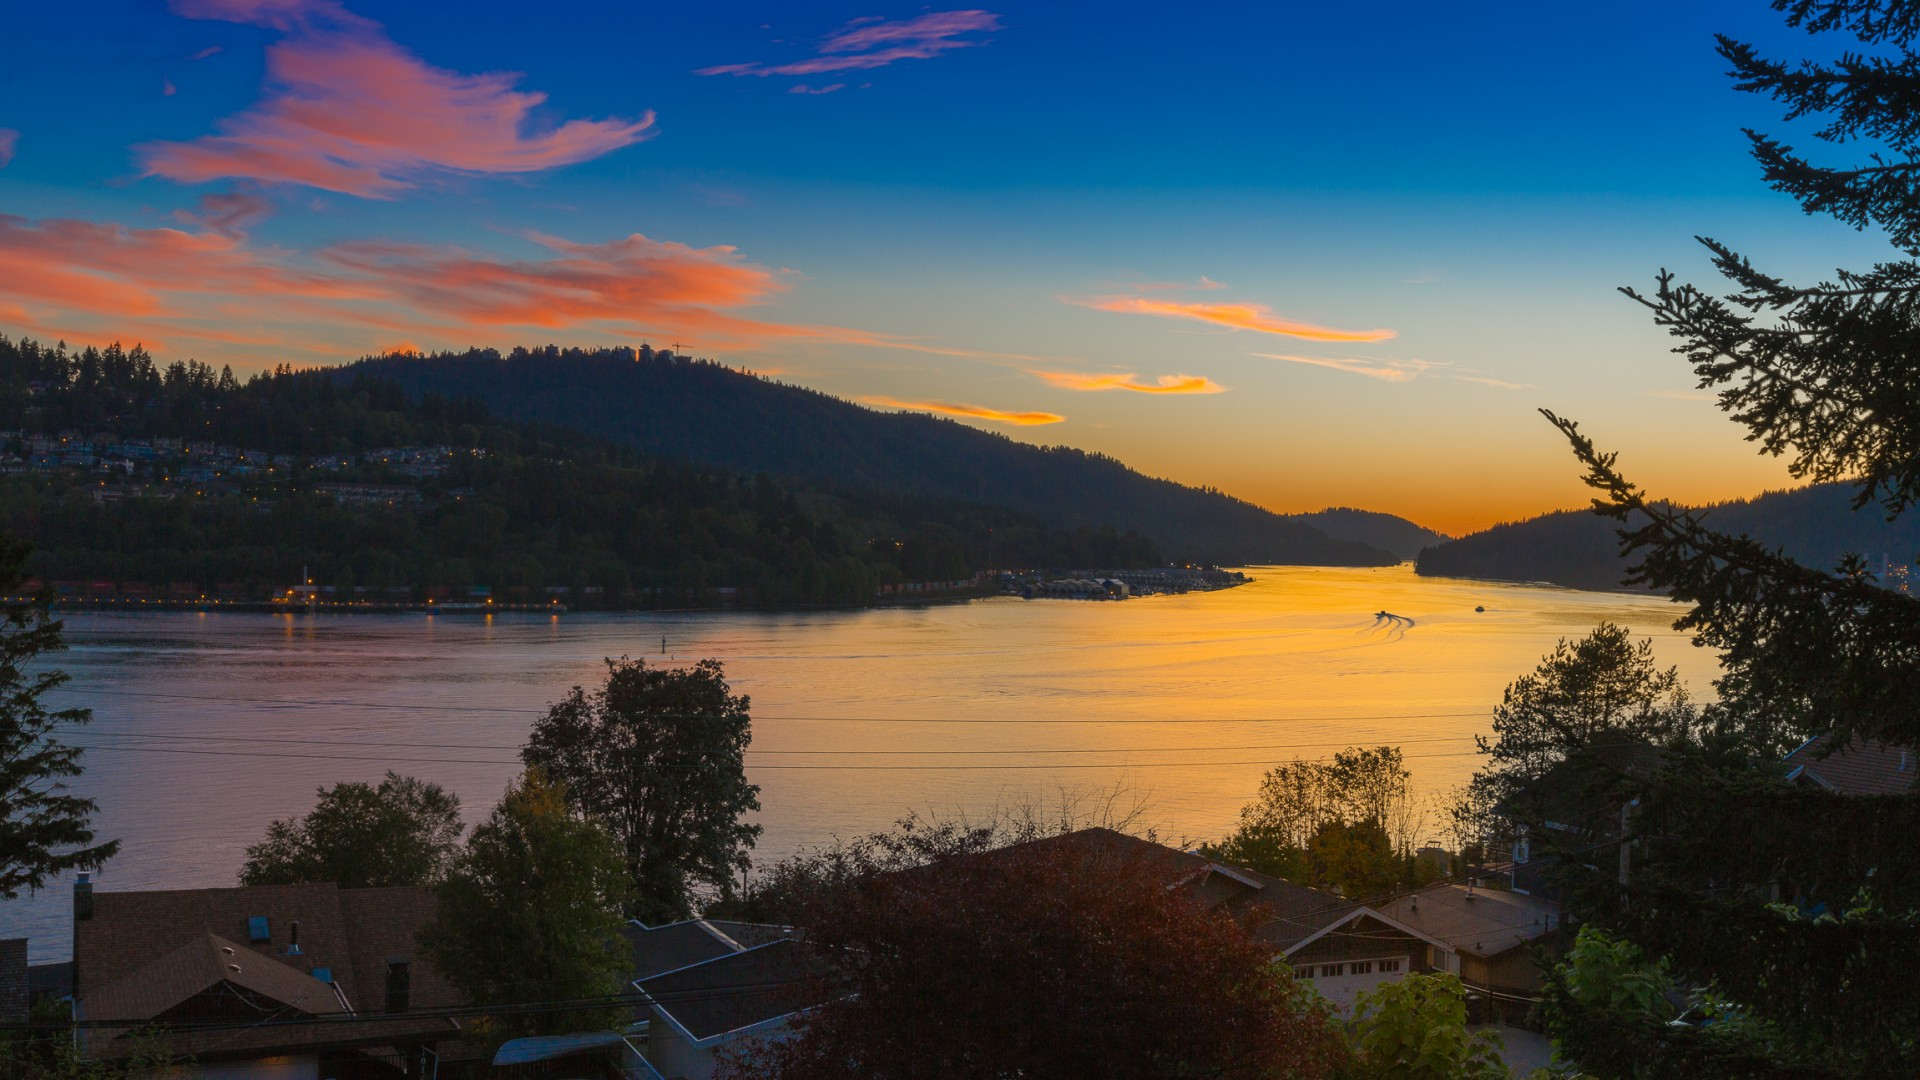 Fern 2015-2343-FS Sunset